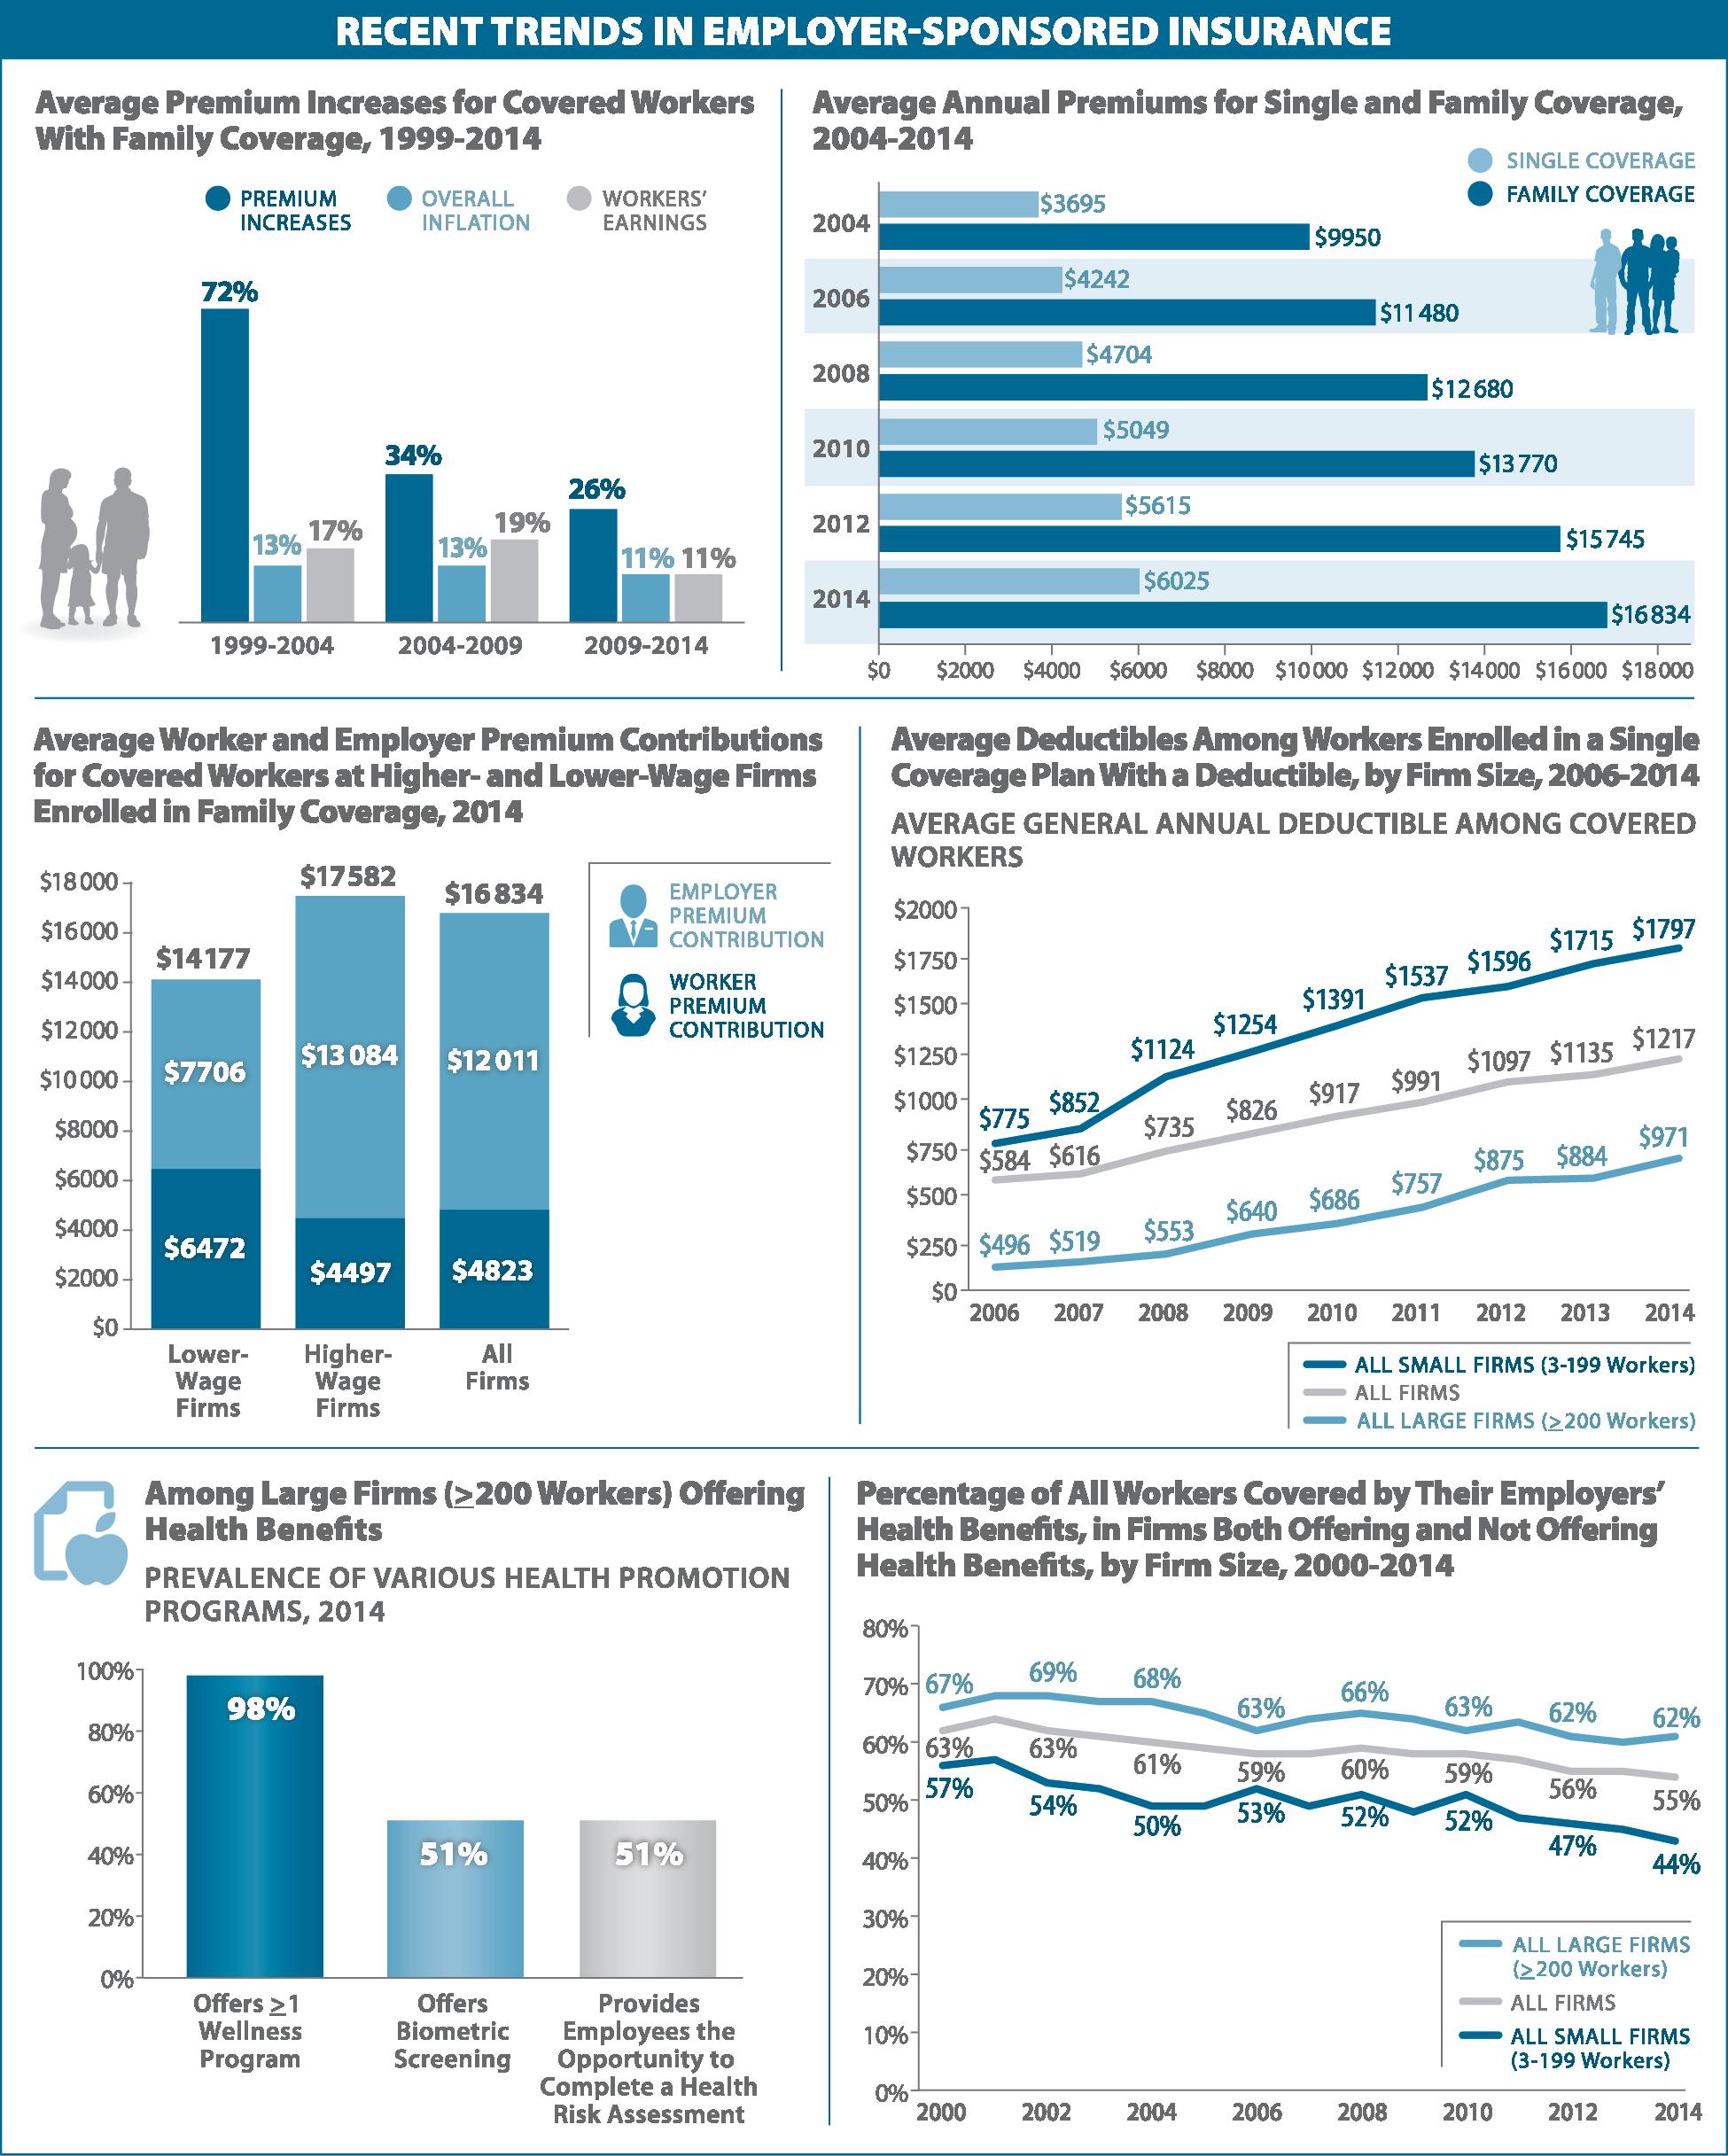 Recent Trends in Employer-Sponsored Insurance | Health ...